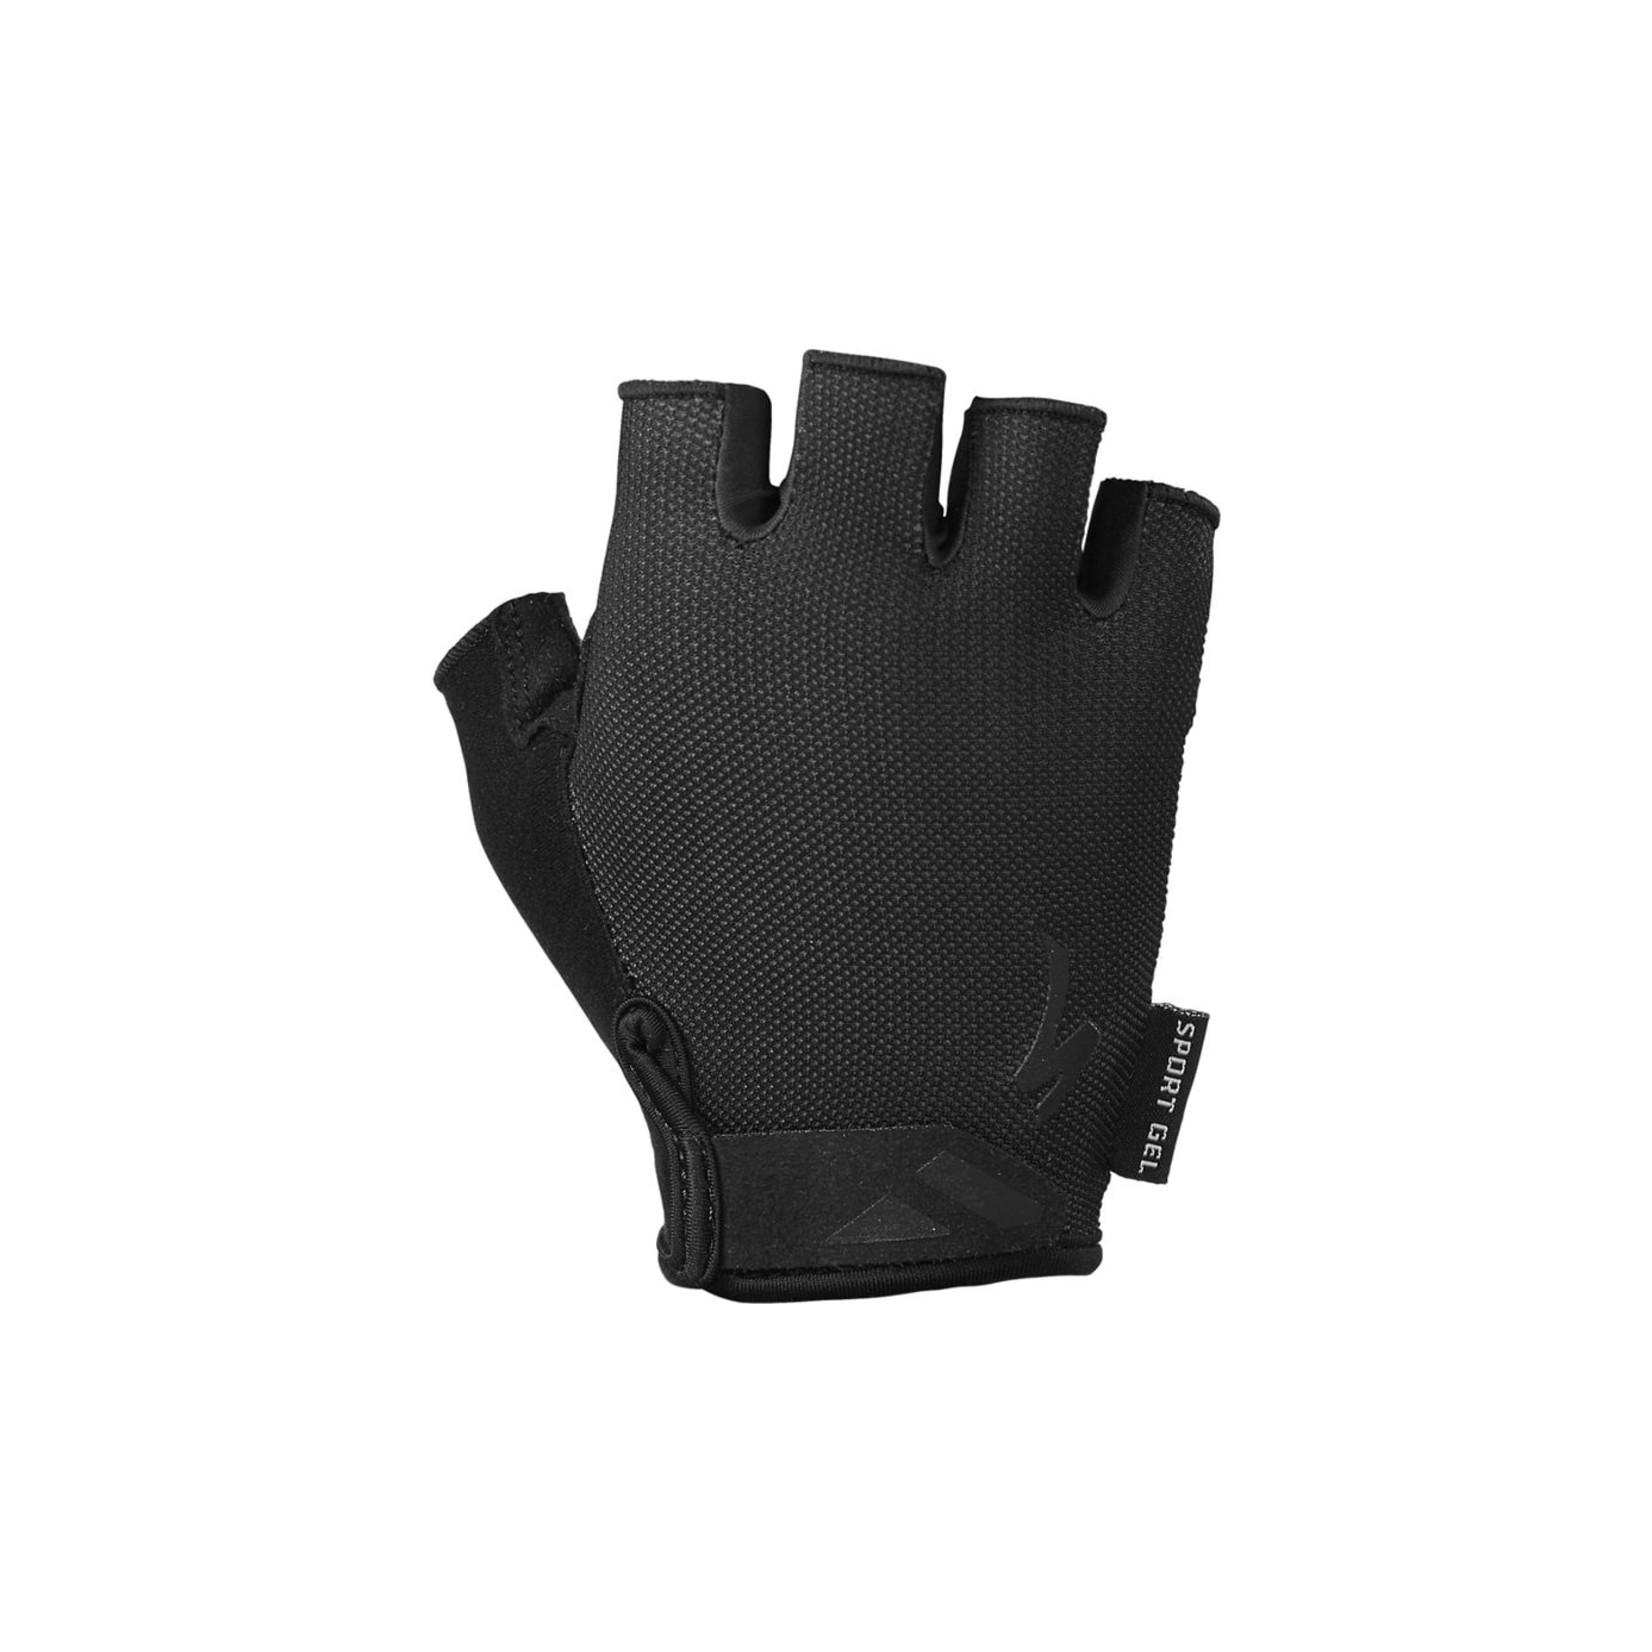 Specialized Specialized Women's BG Sport Gel SF Gloves